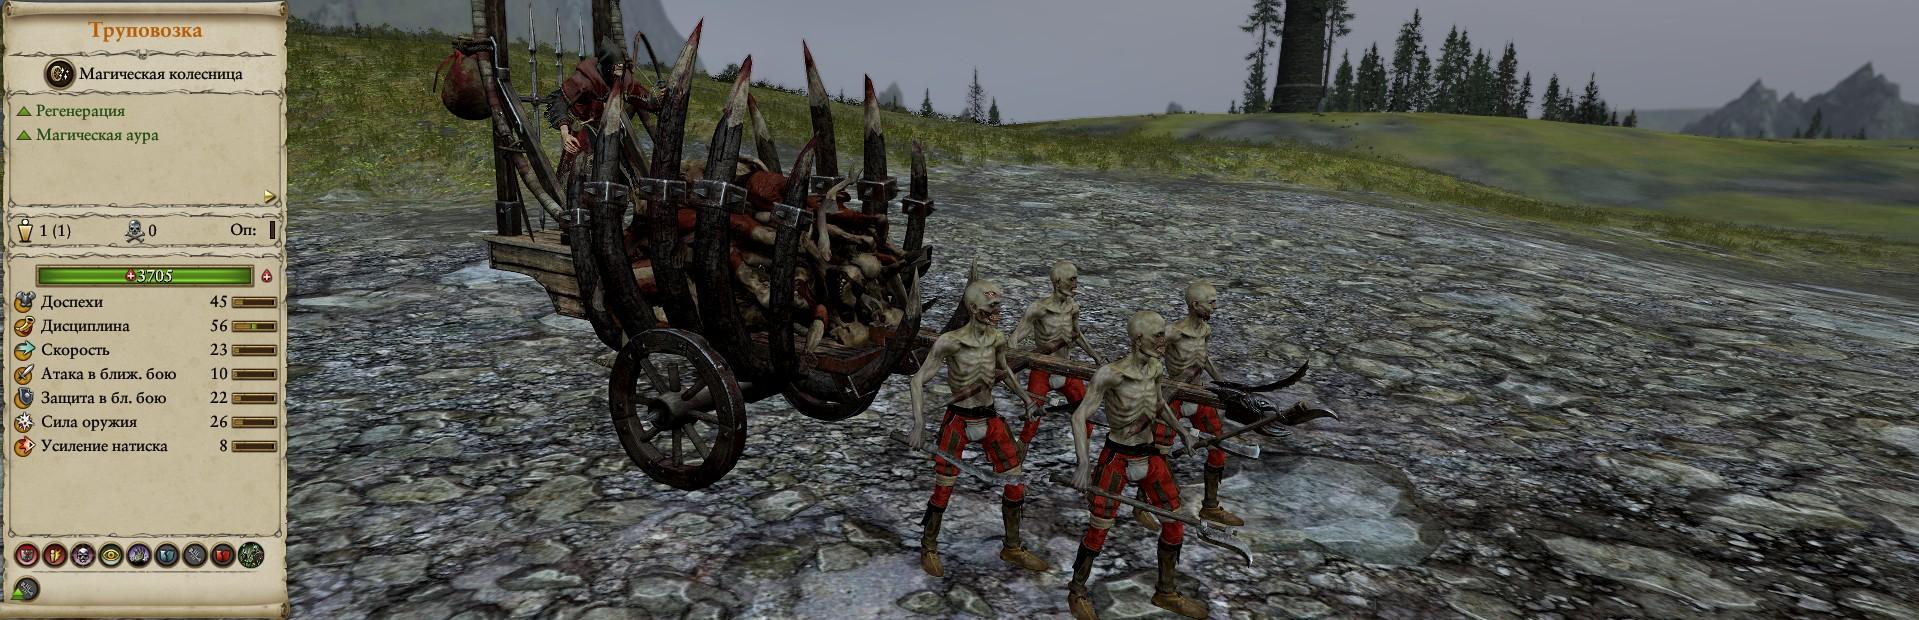 Труповозка warhammer